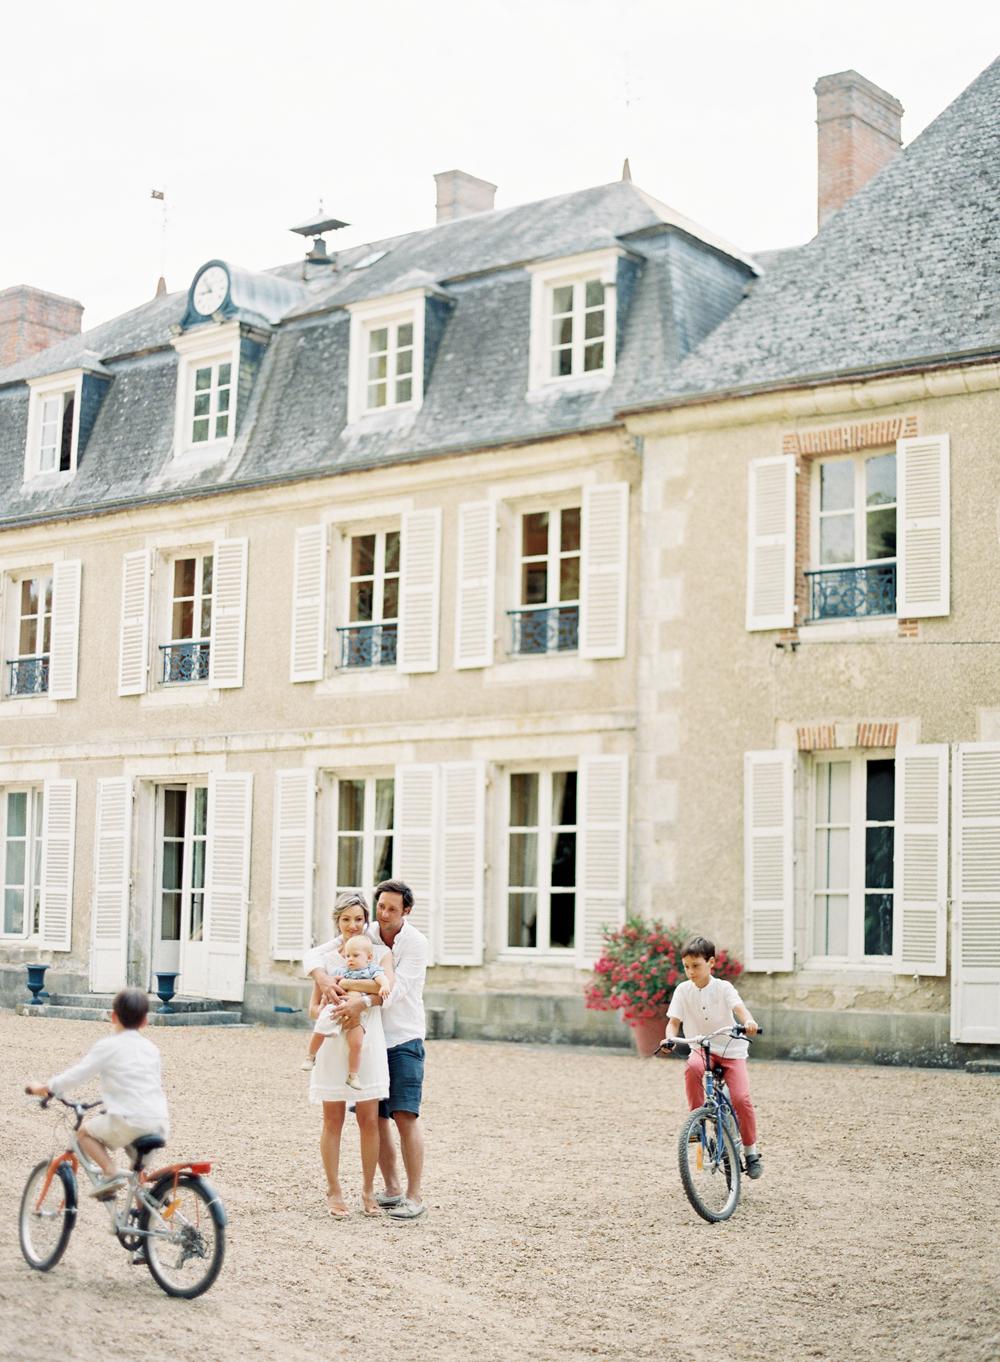 Fine art film wedding photographer, Washington DC, virginia, maryland, destination wedding, family lifestyle session, Chateau de Bouthonvilliers, Dangeau, France